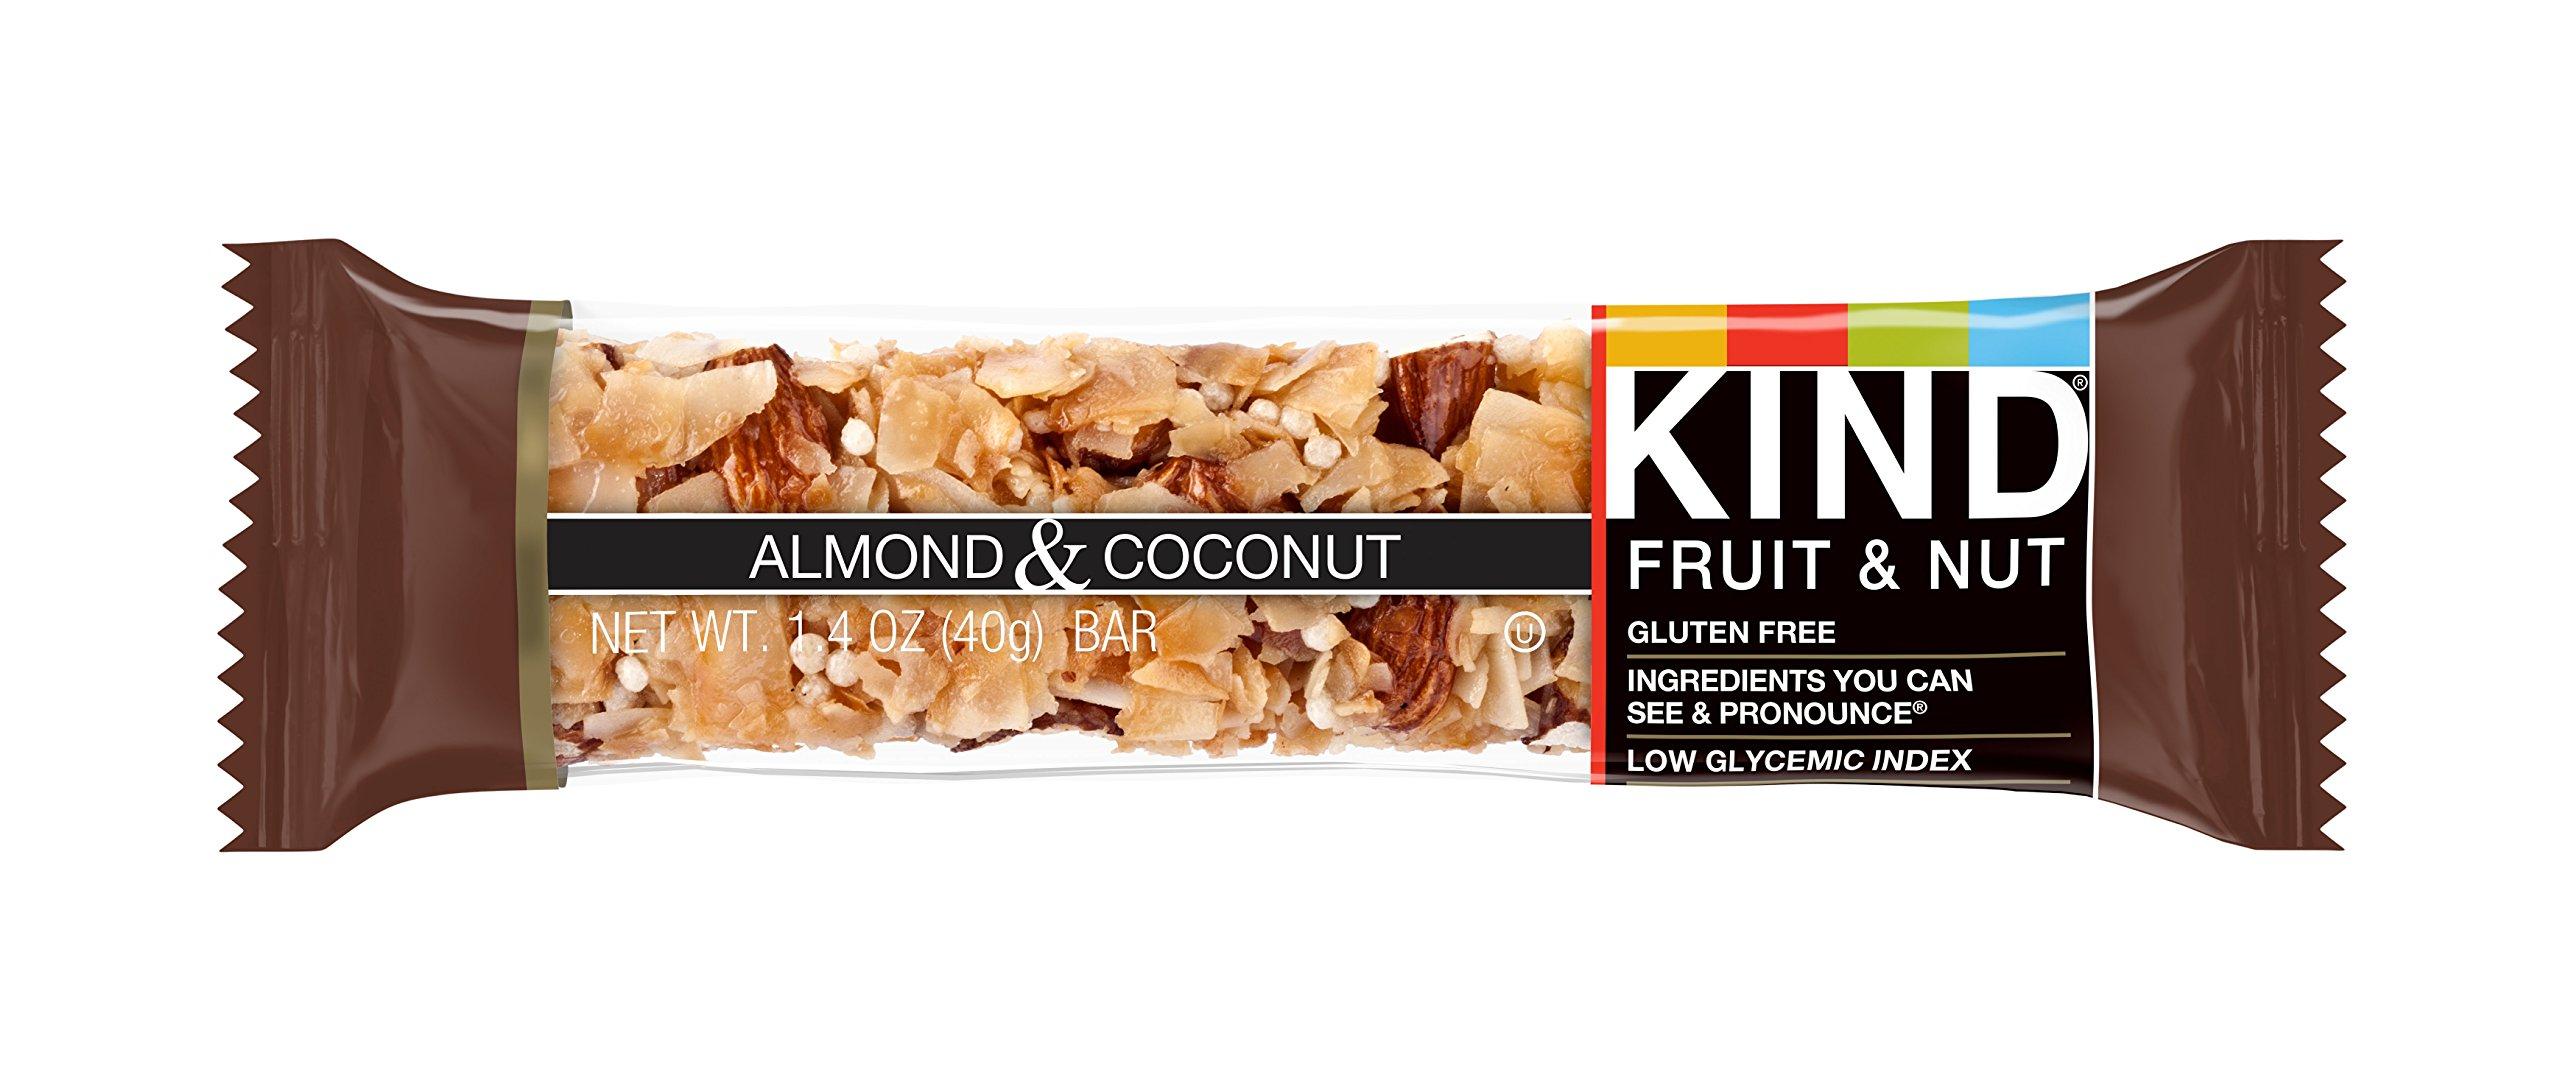 KIND ALMOND & COCONUT KIND 12/1.4 OZ